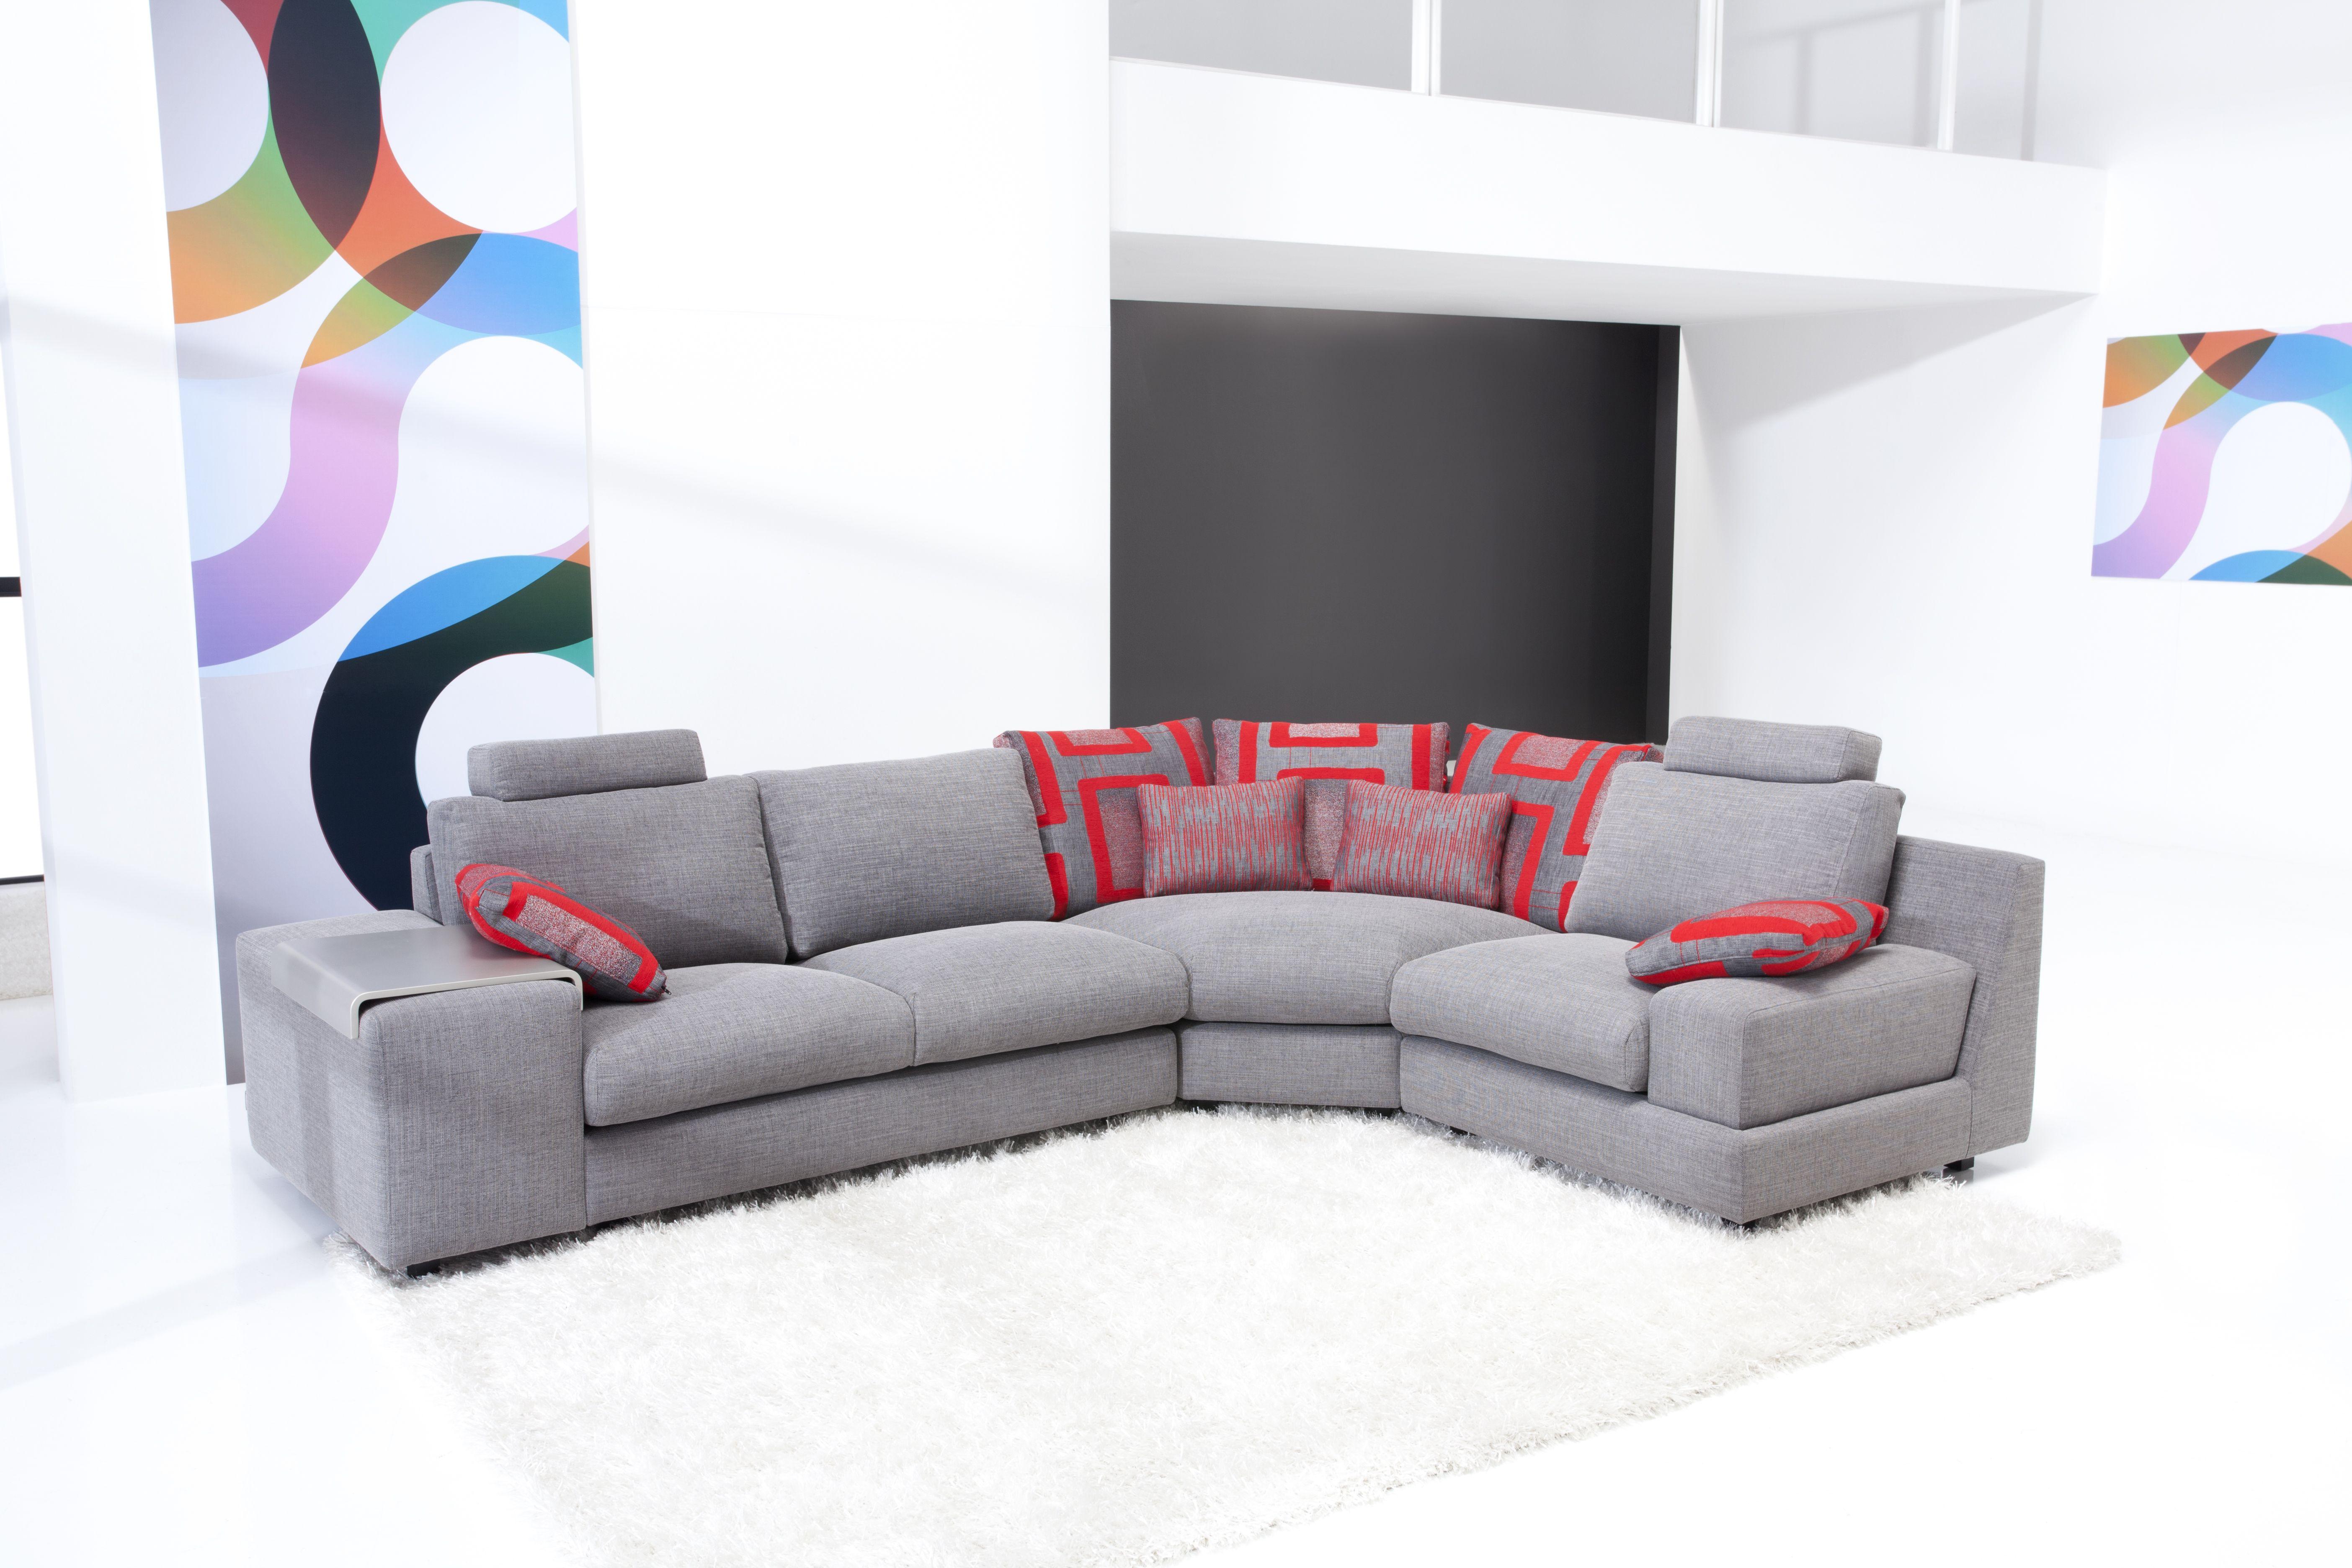 modular sofas ireland sofa 3 seater malaysia fama calisto we sell love corner fabric